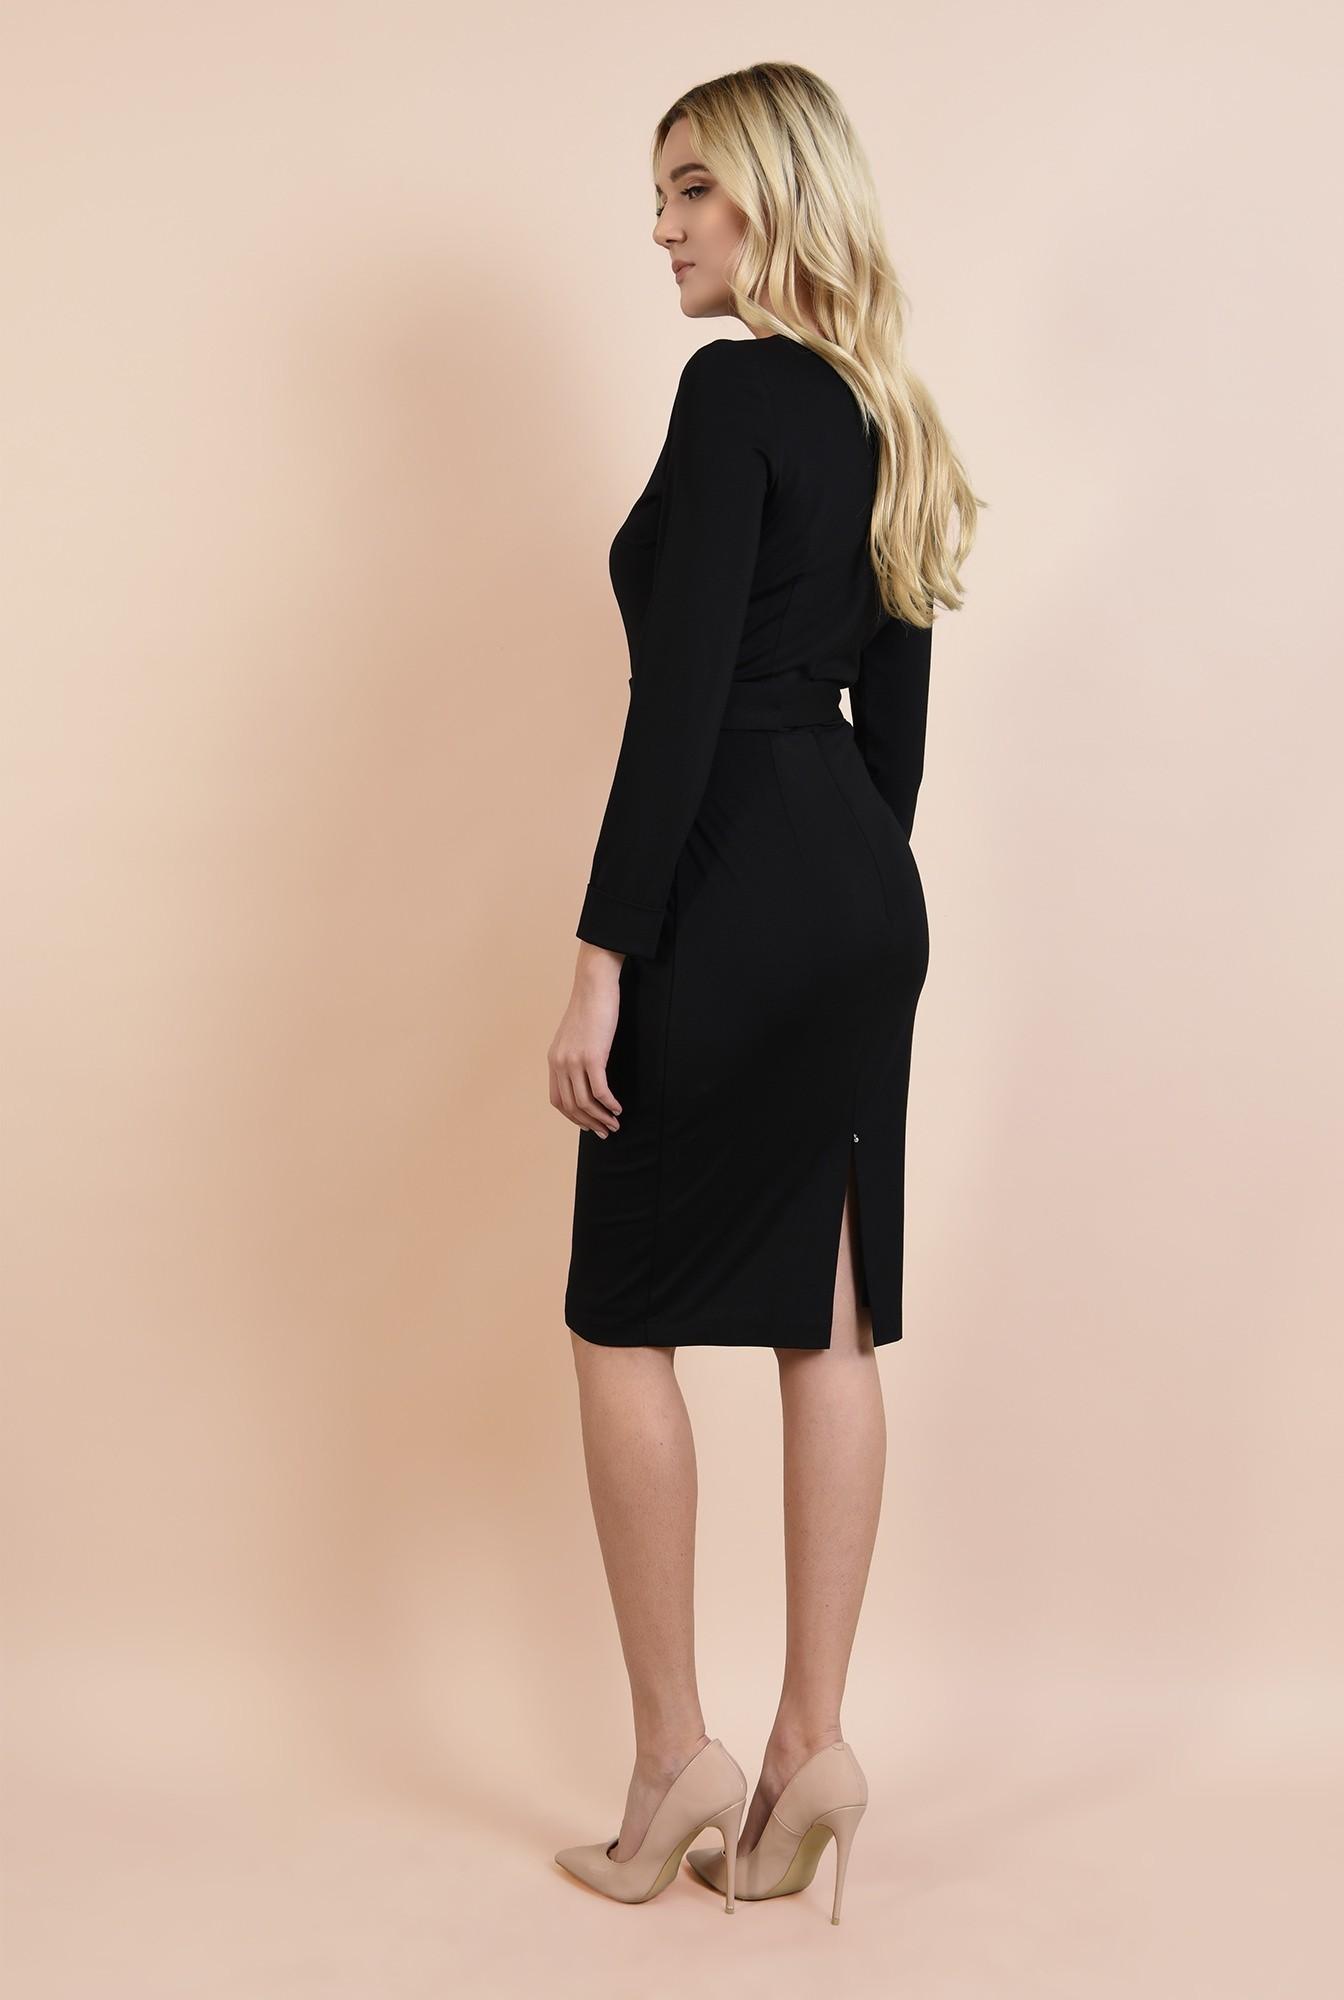 1 - 360 - rochie neagra, casual, bodycon, cu centura, catarama argintie